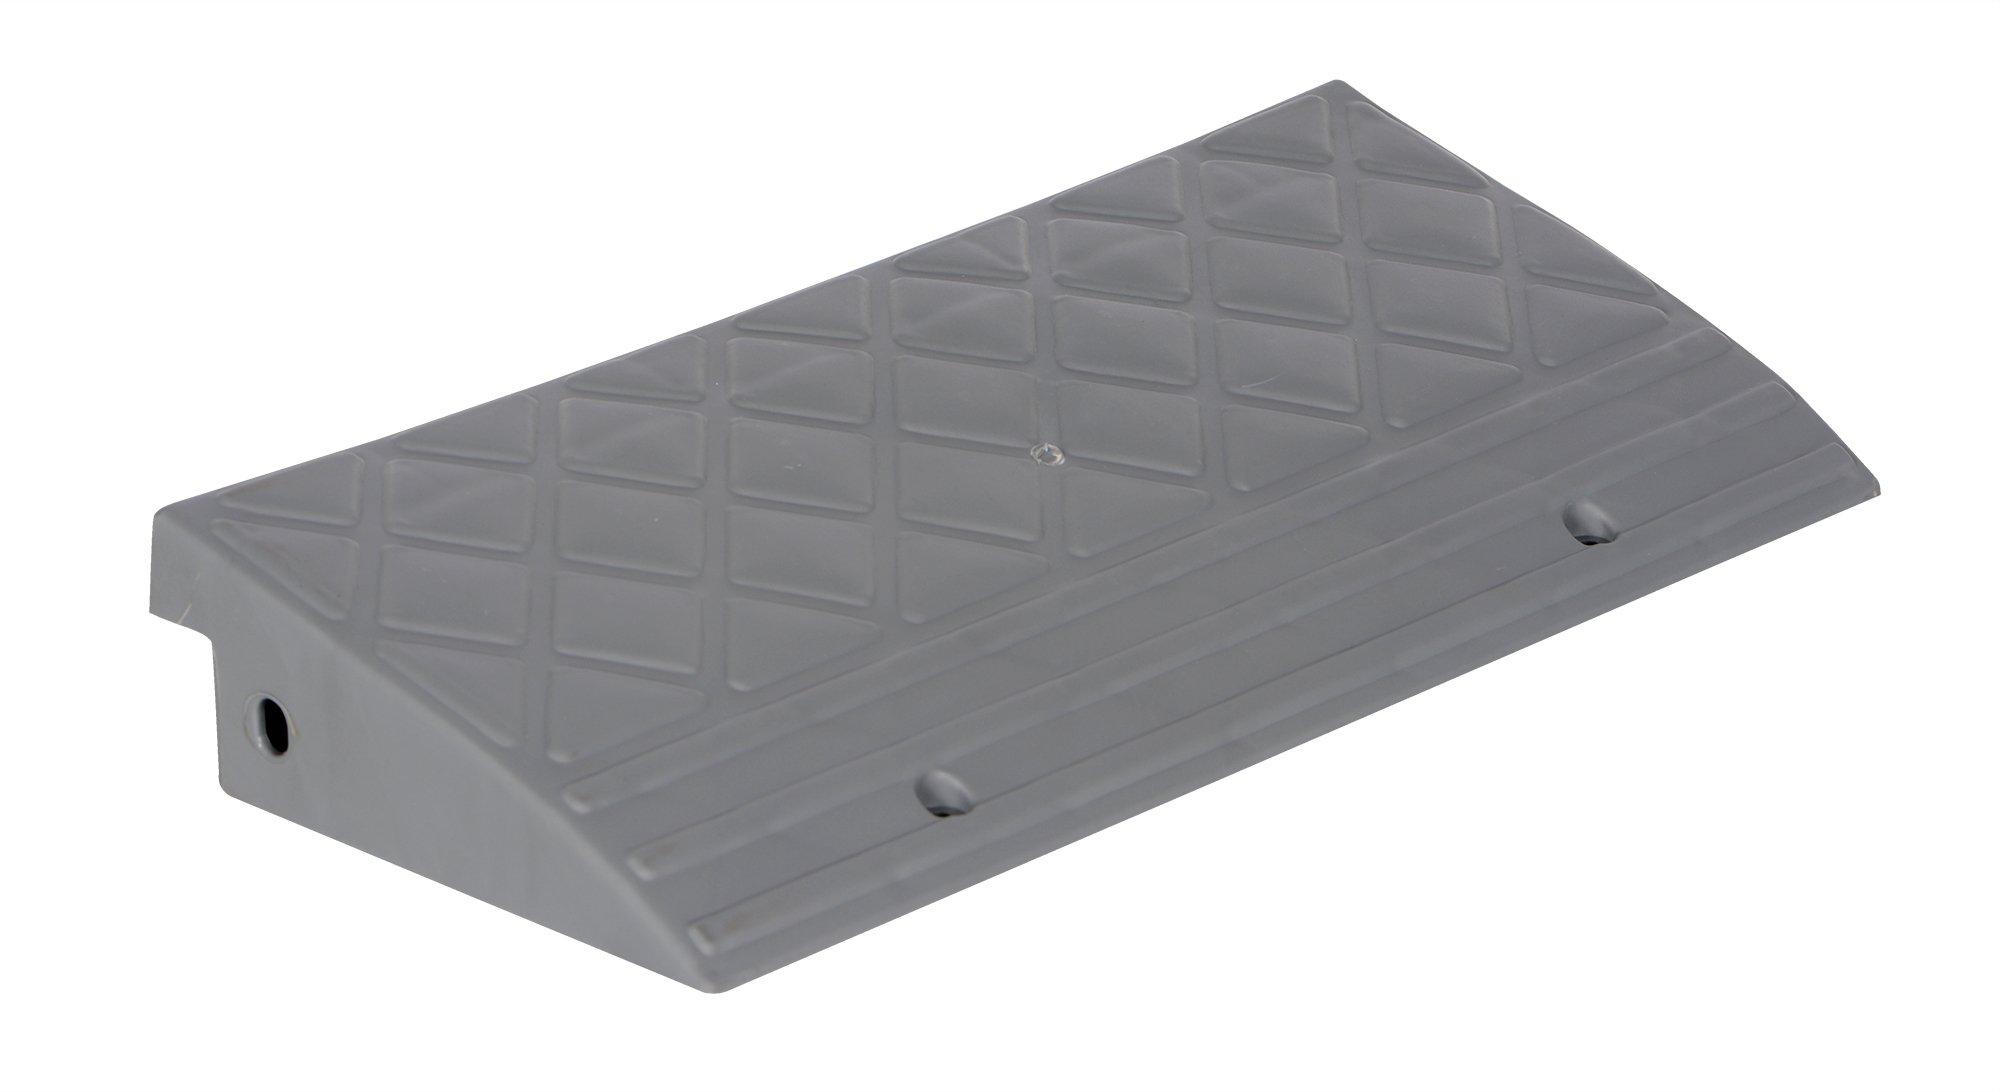 Vestil MPR-2310-G Plastic Multi Purpose Ramp, 5000 lbs Capacity, 10-1/2'' Length, 23-1/4'' Width, 3-11/16'' Height